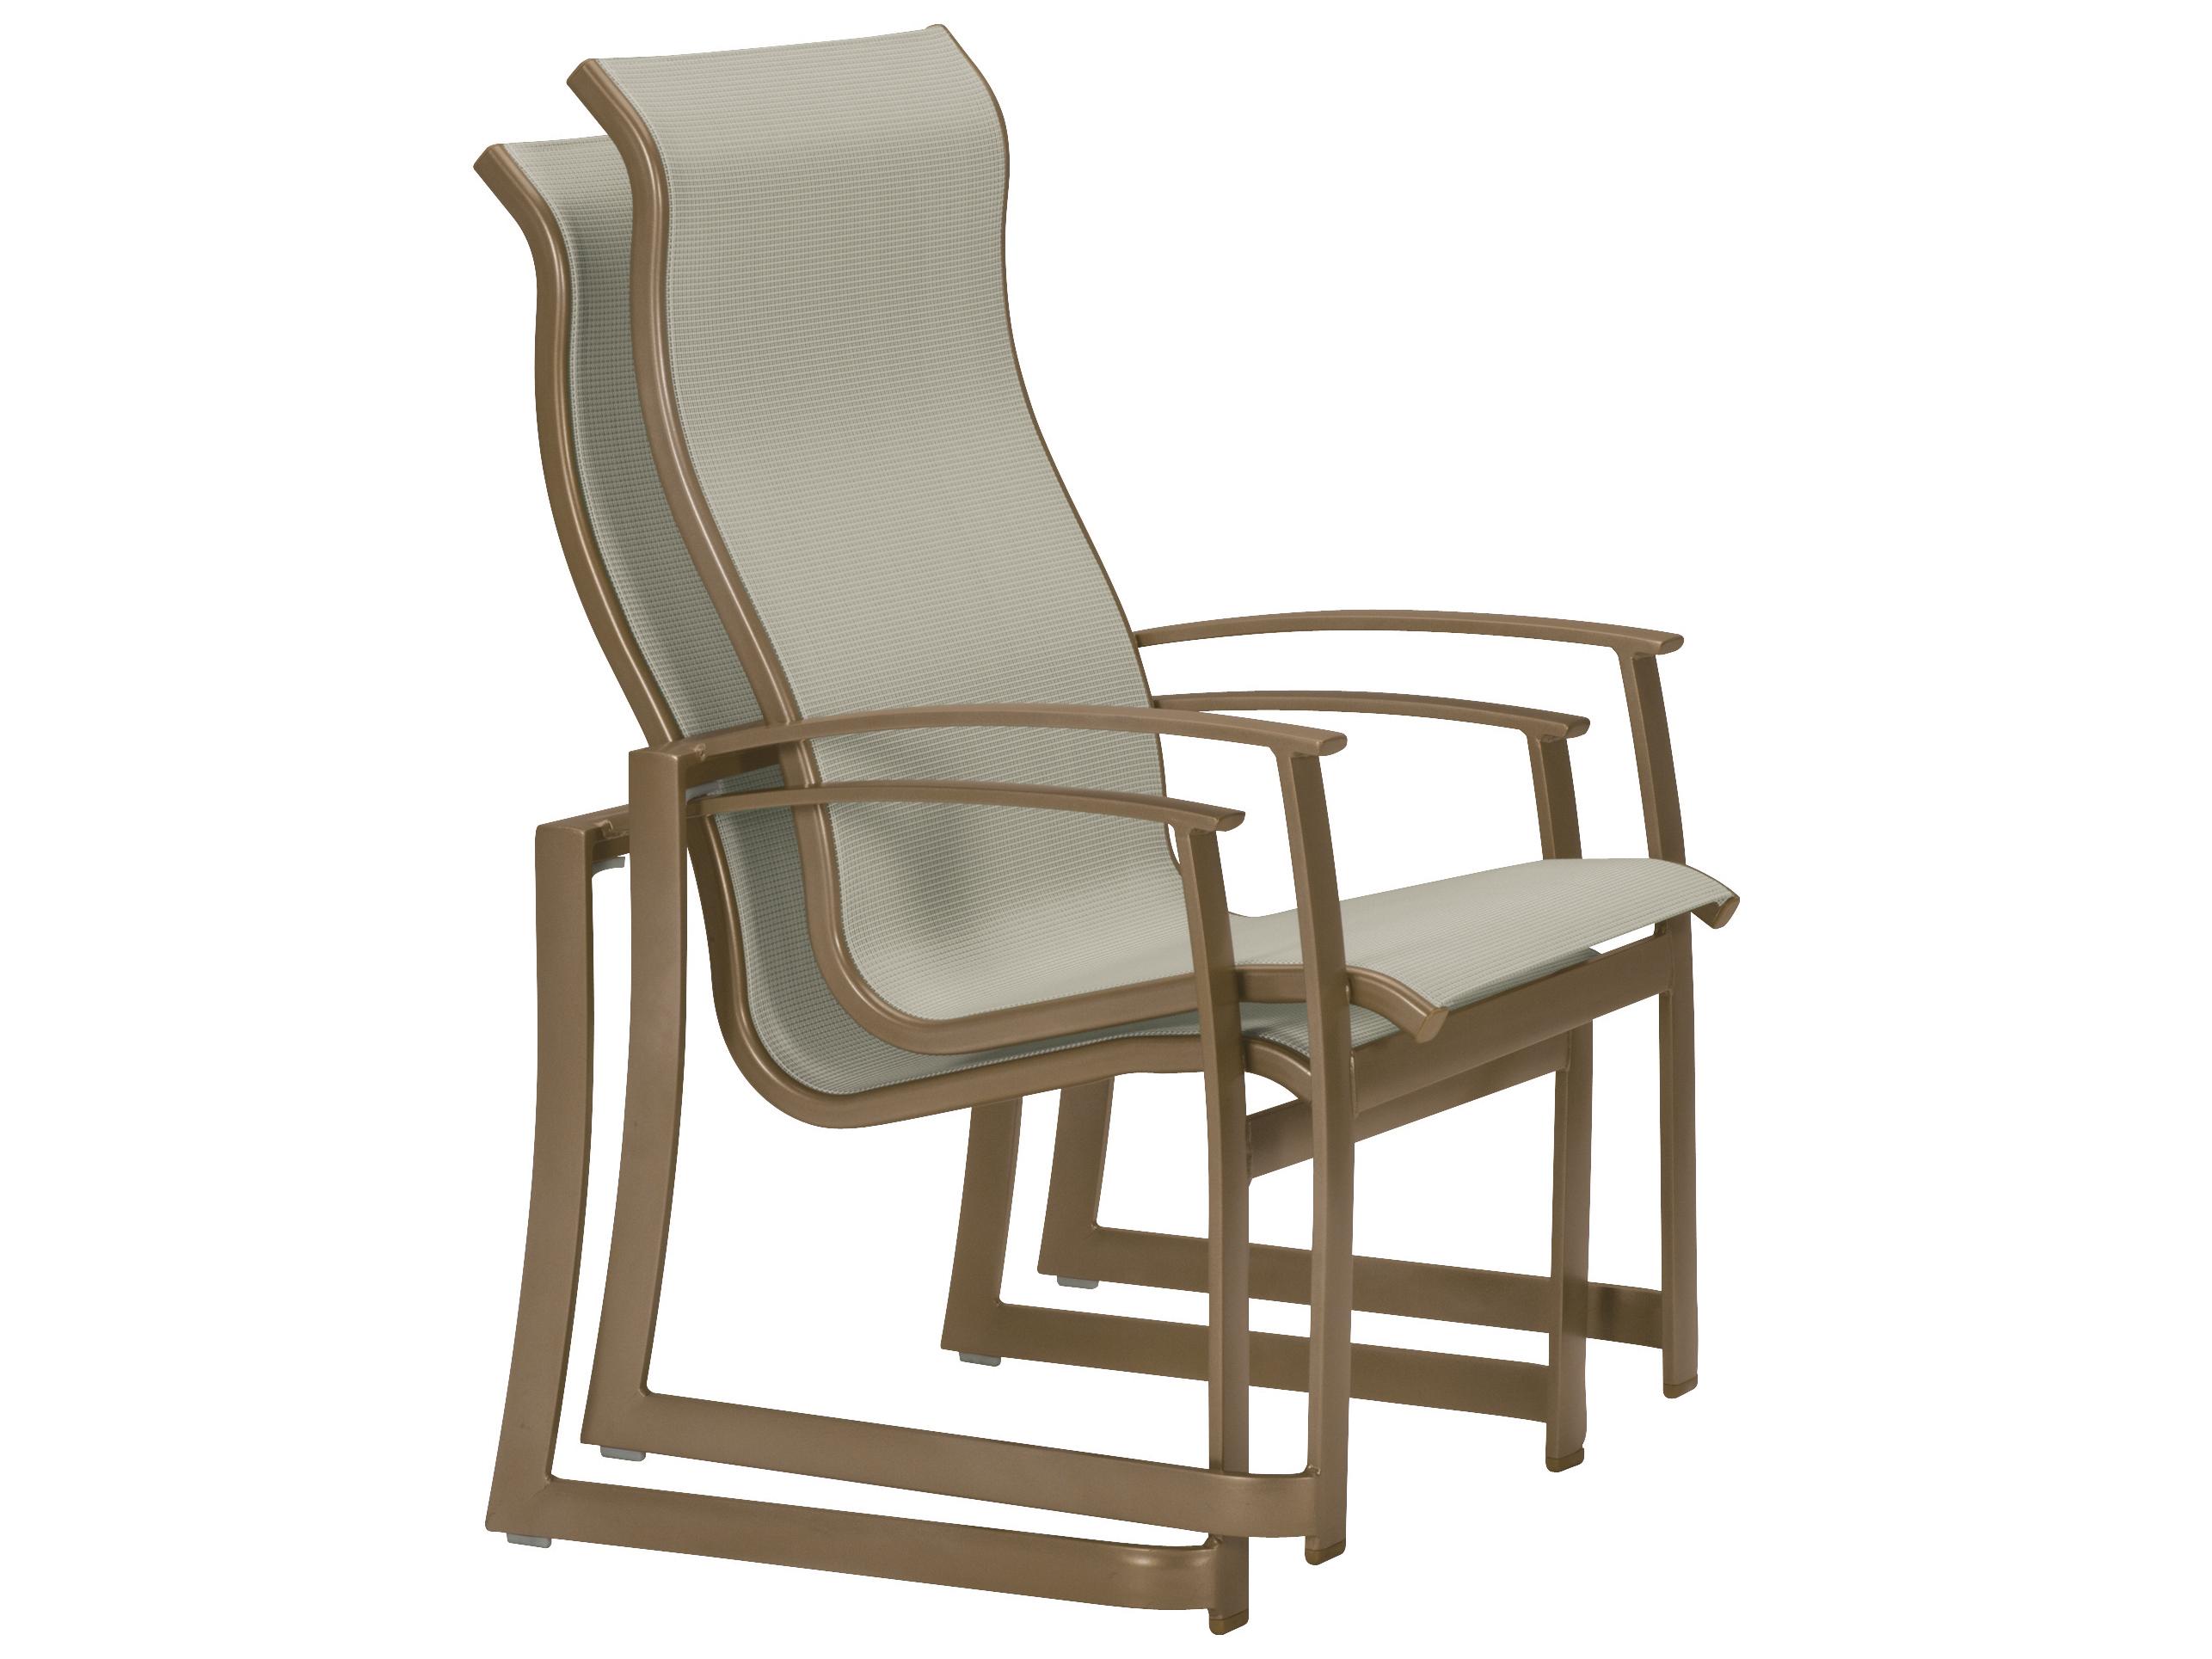 Tropitone Mainsail Sling Dining Chairs 181001